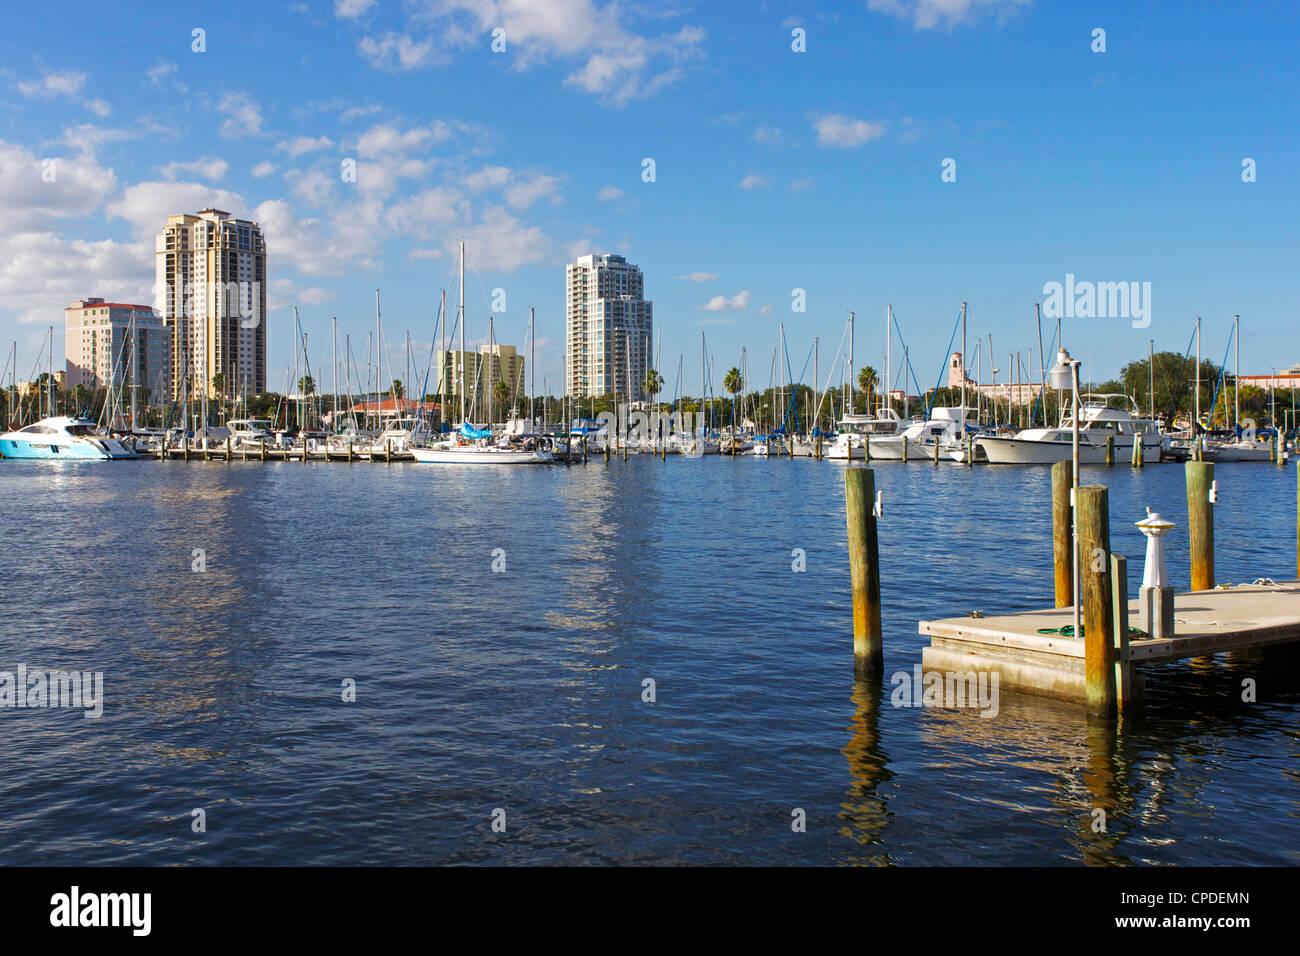 St. Petersburg, Gulf Coast, Florida, United States of America, North America - Stock Image